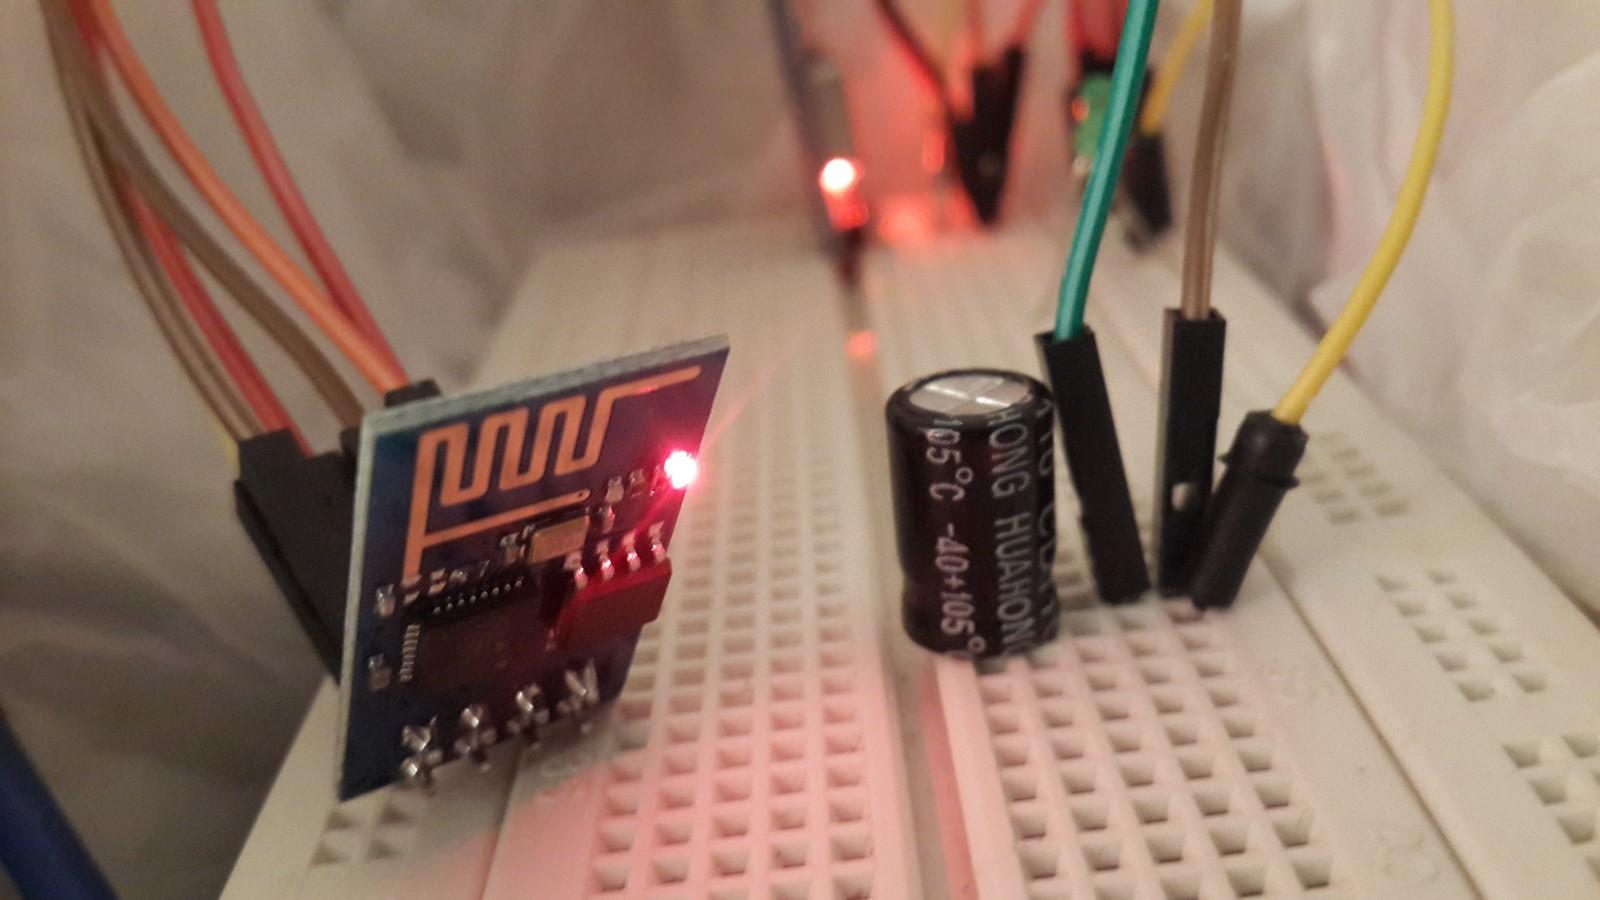 How To Check A Relay >> ESP8266 - Flash NodeMCU, write lua script, and control a water heater